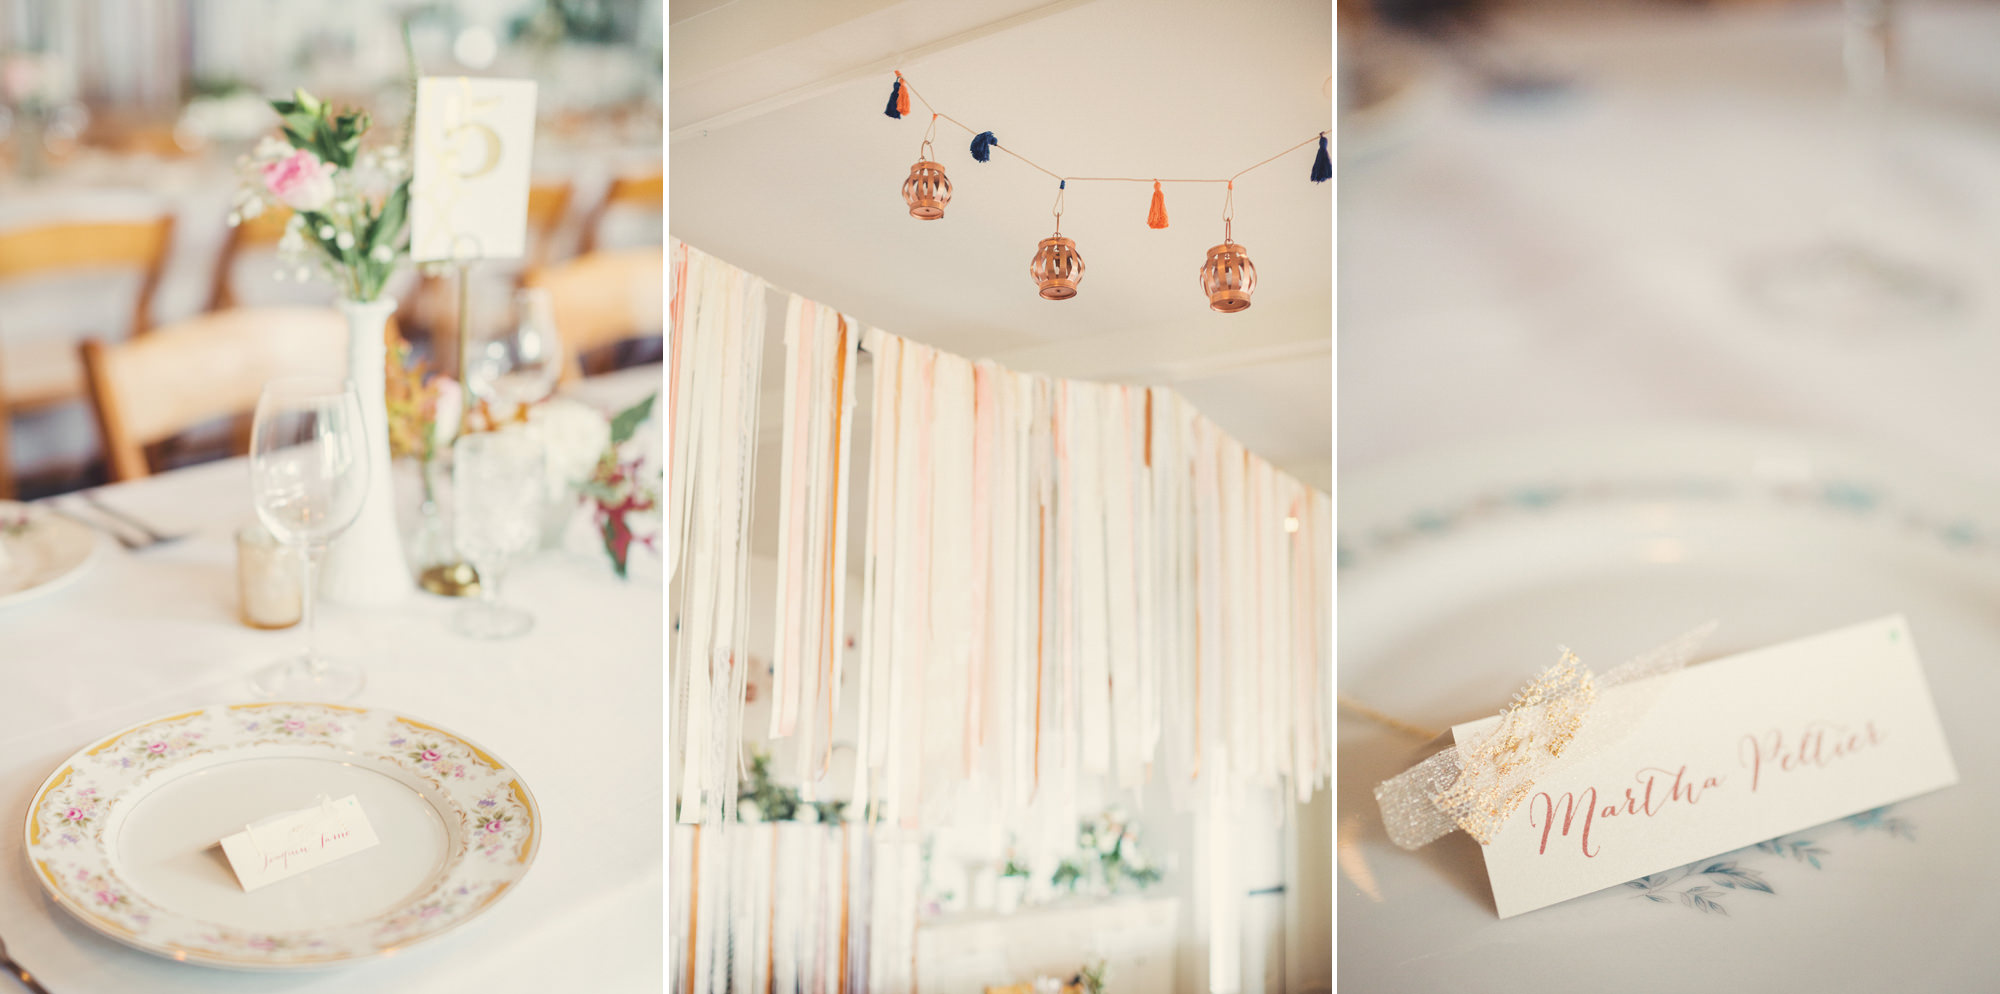 Little River Inn Wedding@Anne-Claire Brun 152